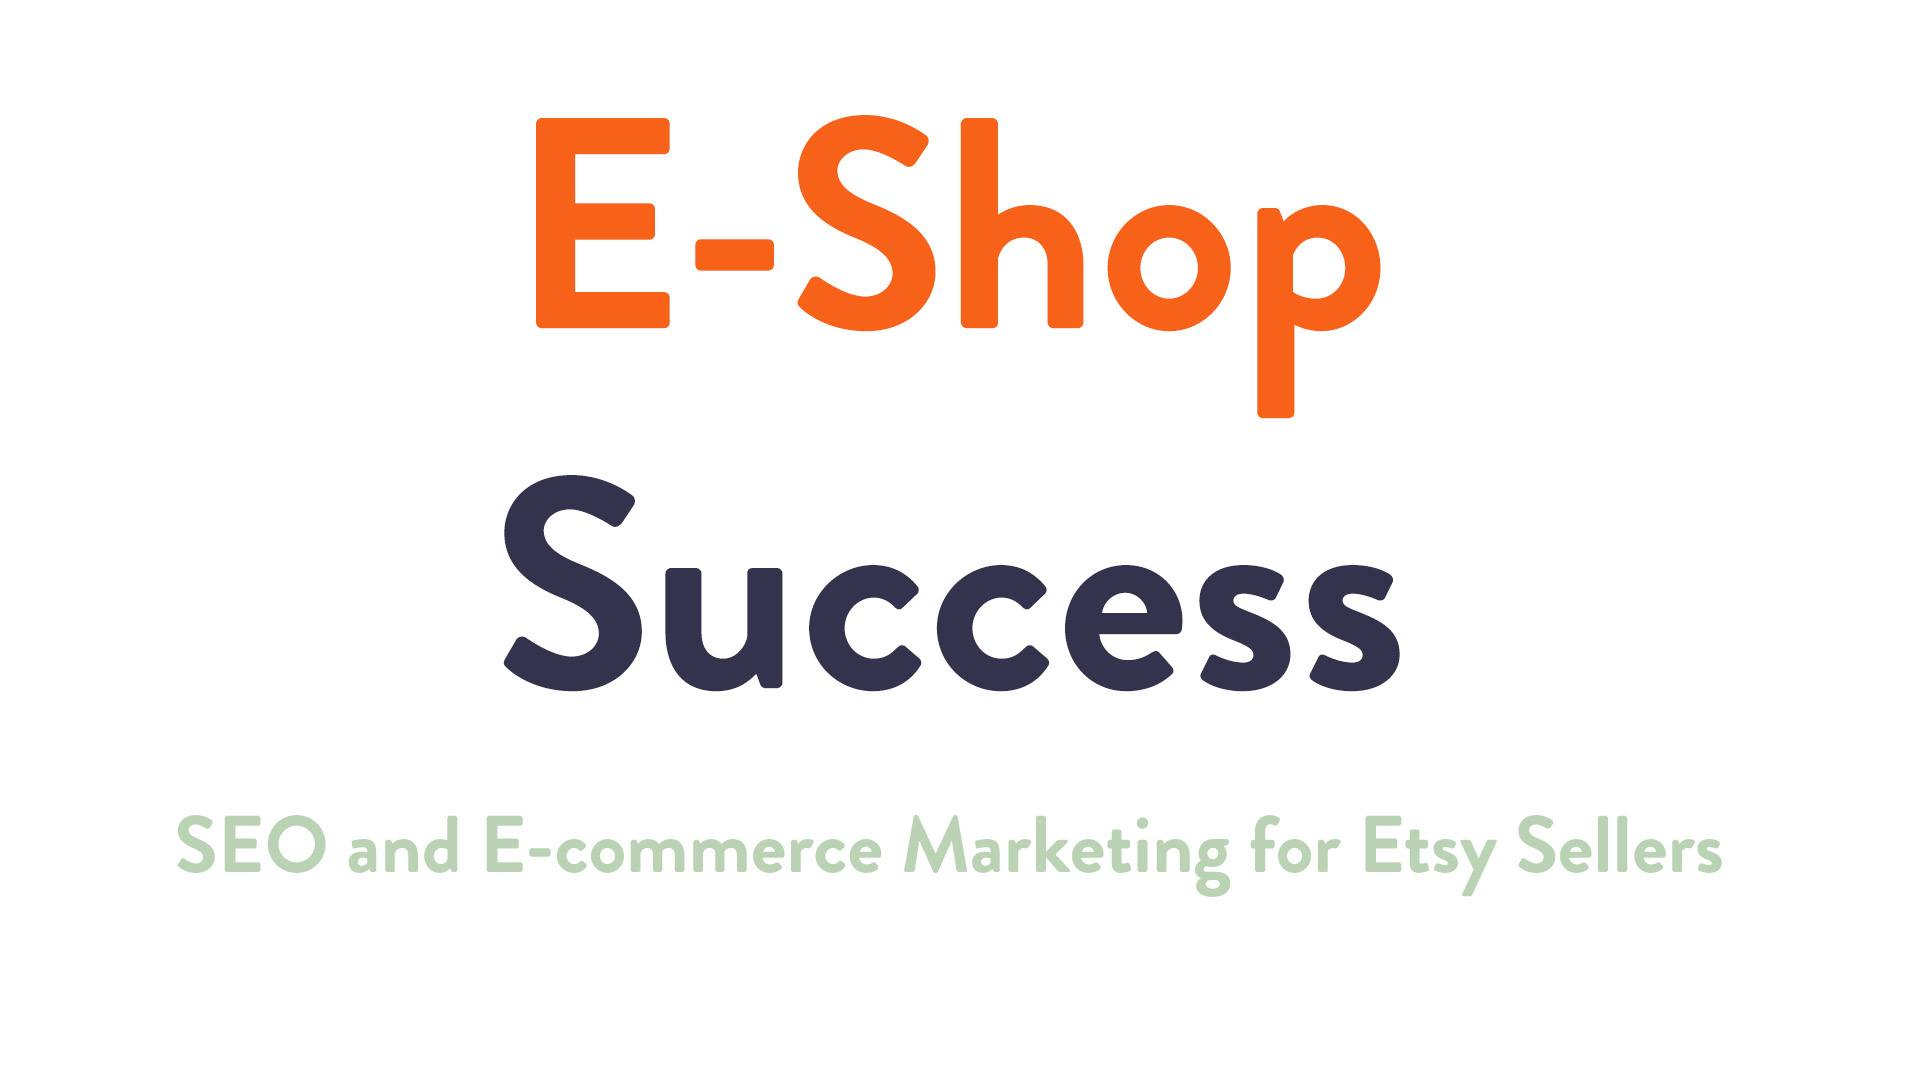 E-Shop Success Marketing course logo